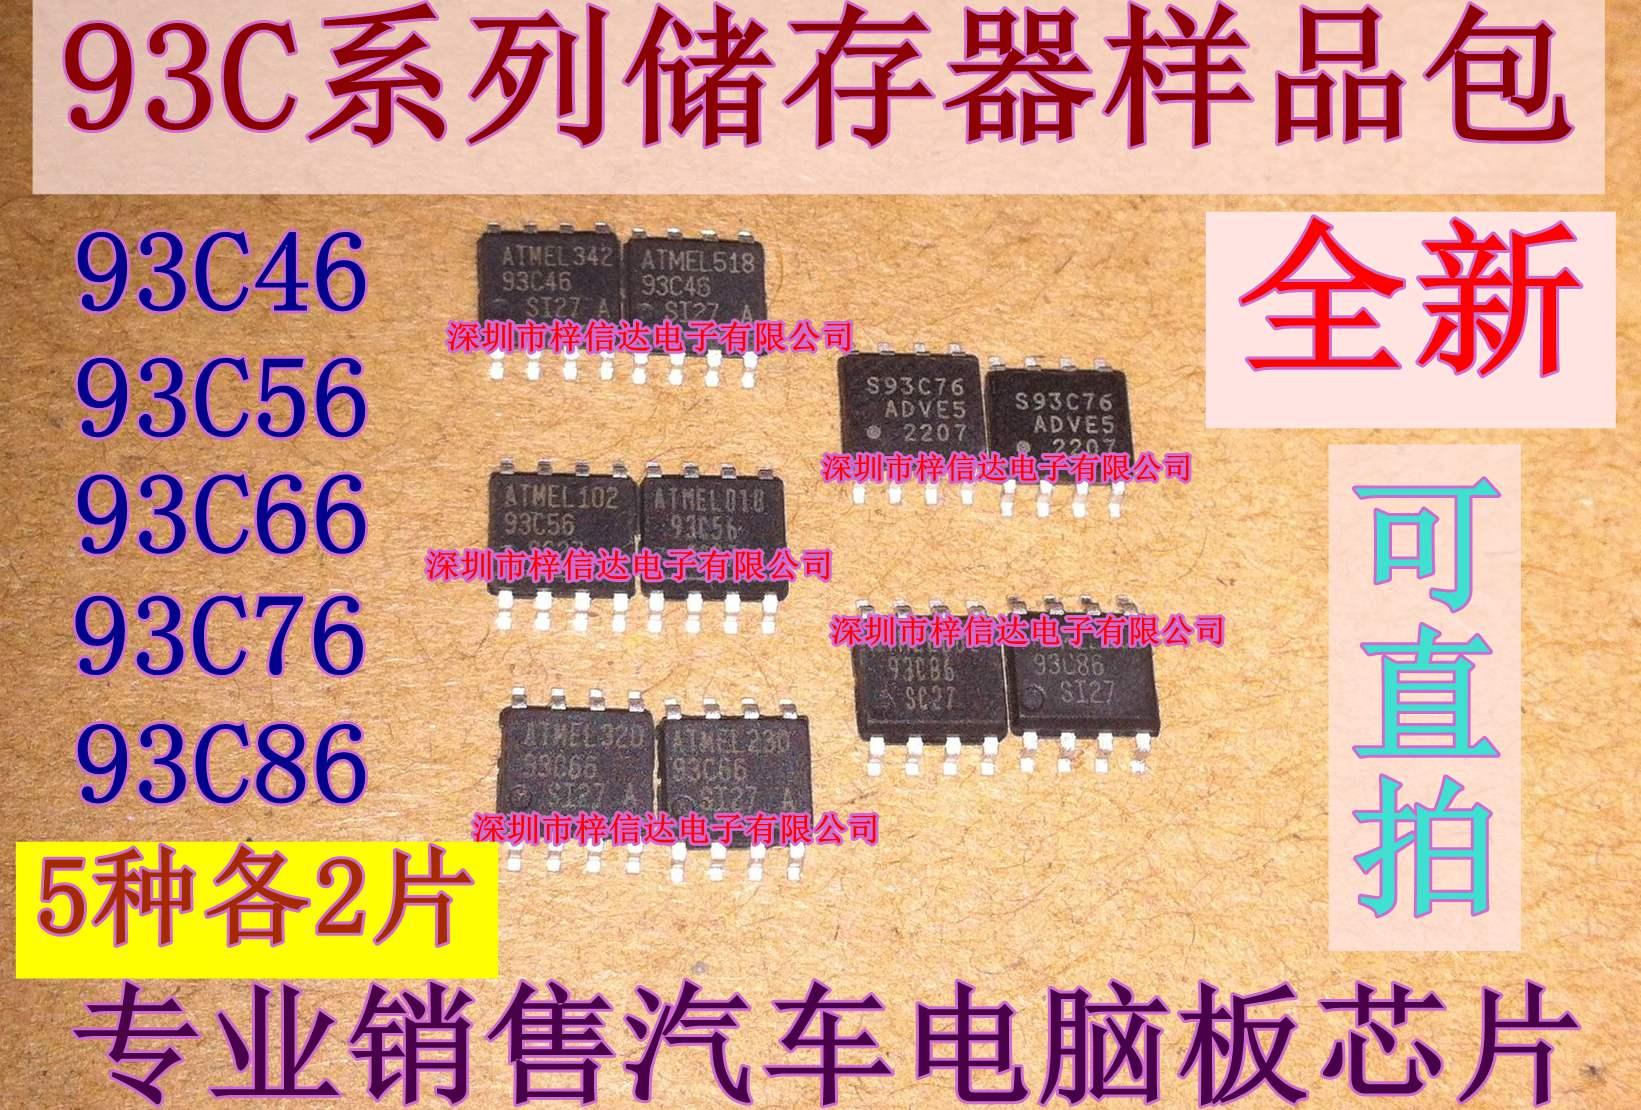 93C46 93C56 93C66 93C76 93C86 car instrument memory sample package a total  of 10